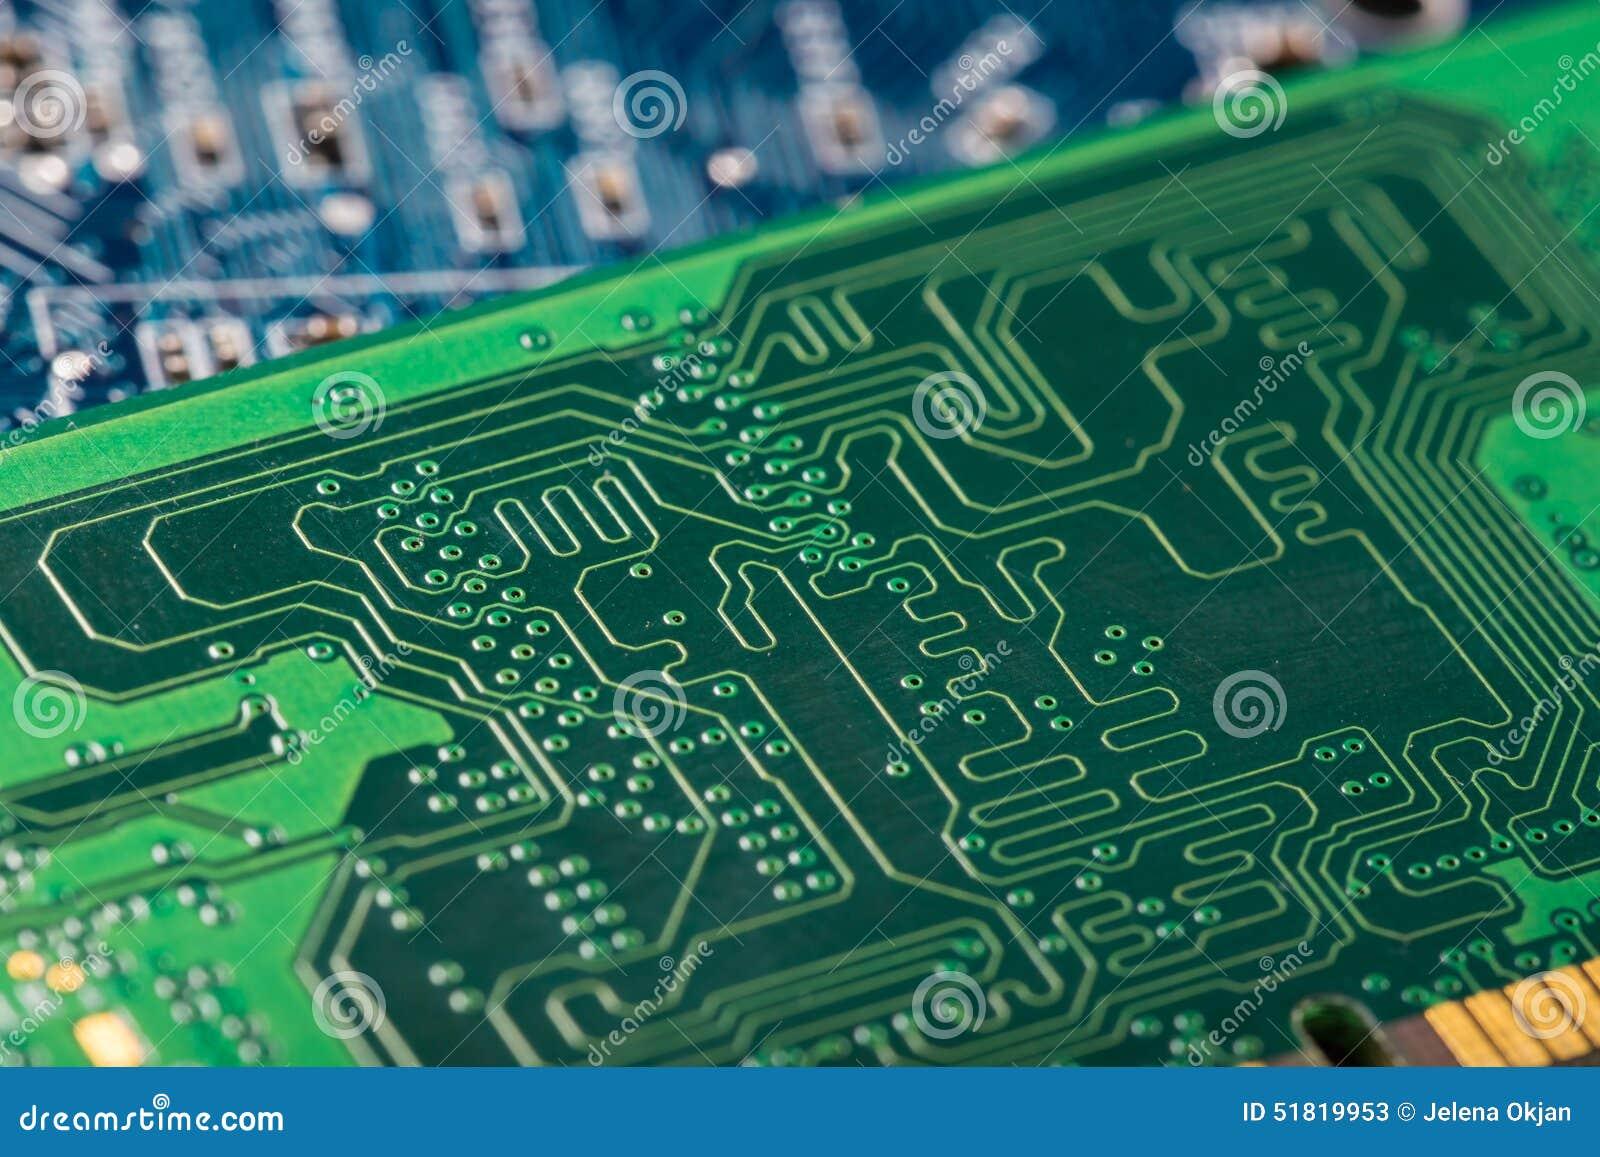 Computer circuitboard